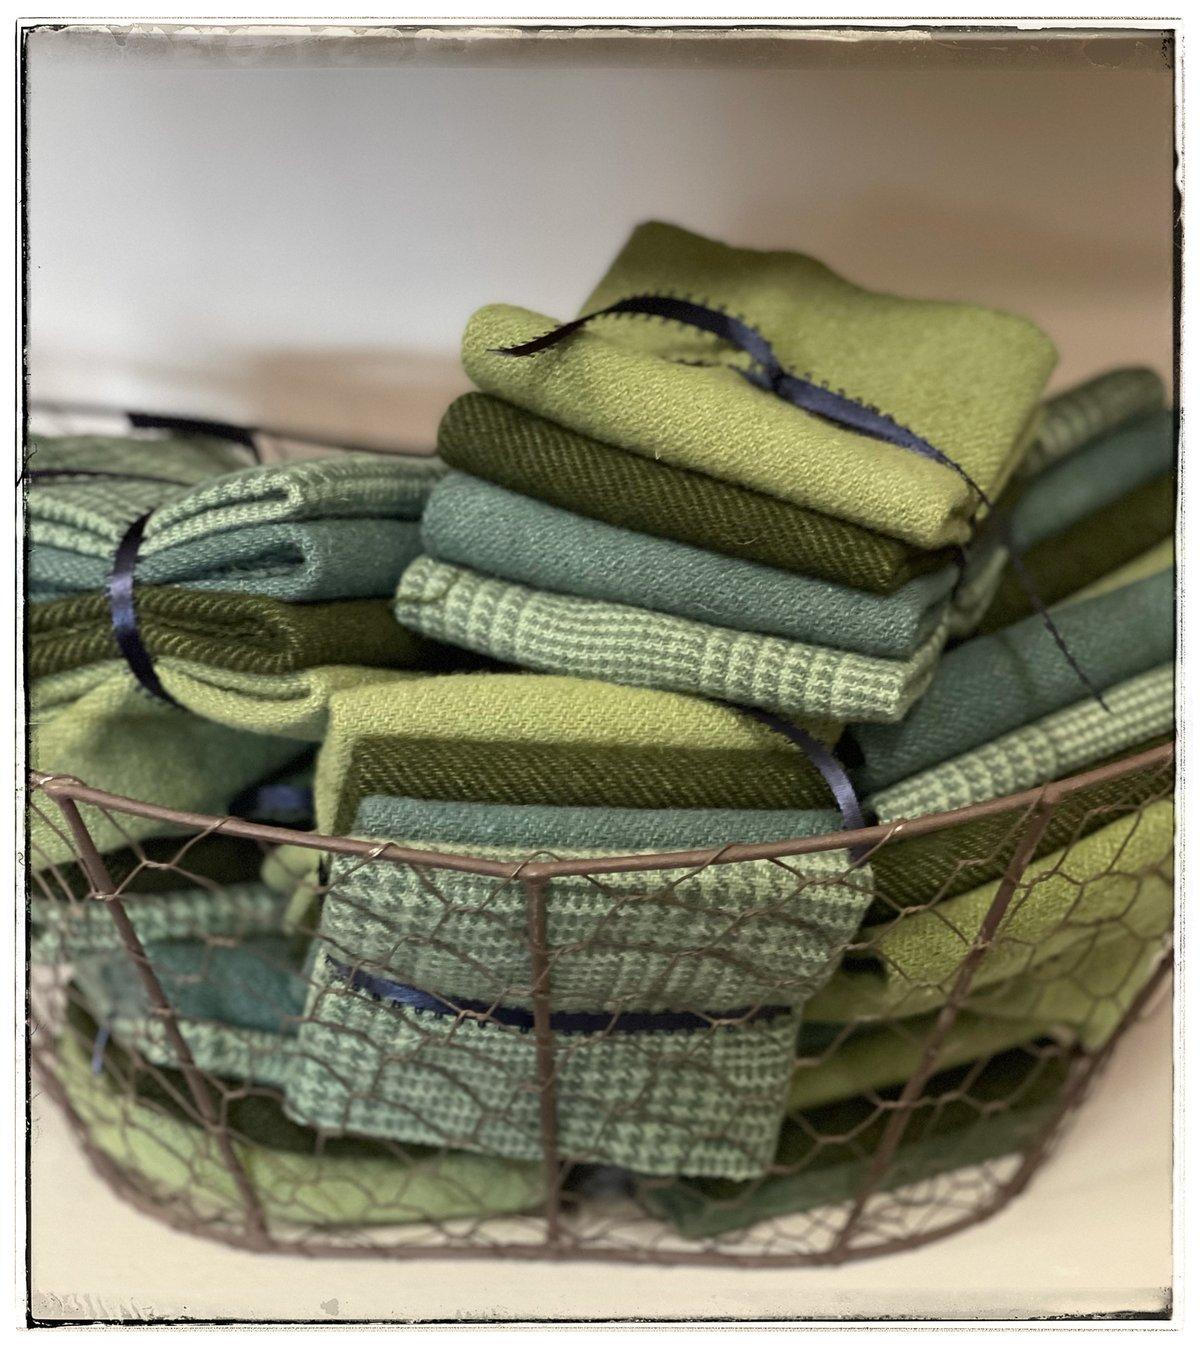 Leafy Greens Hand Dyed Wool bundles